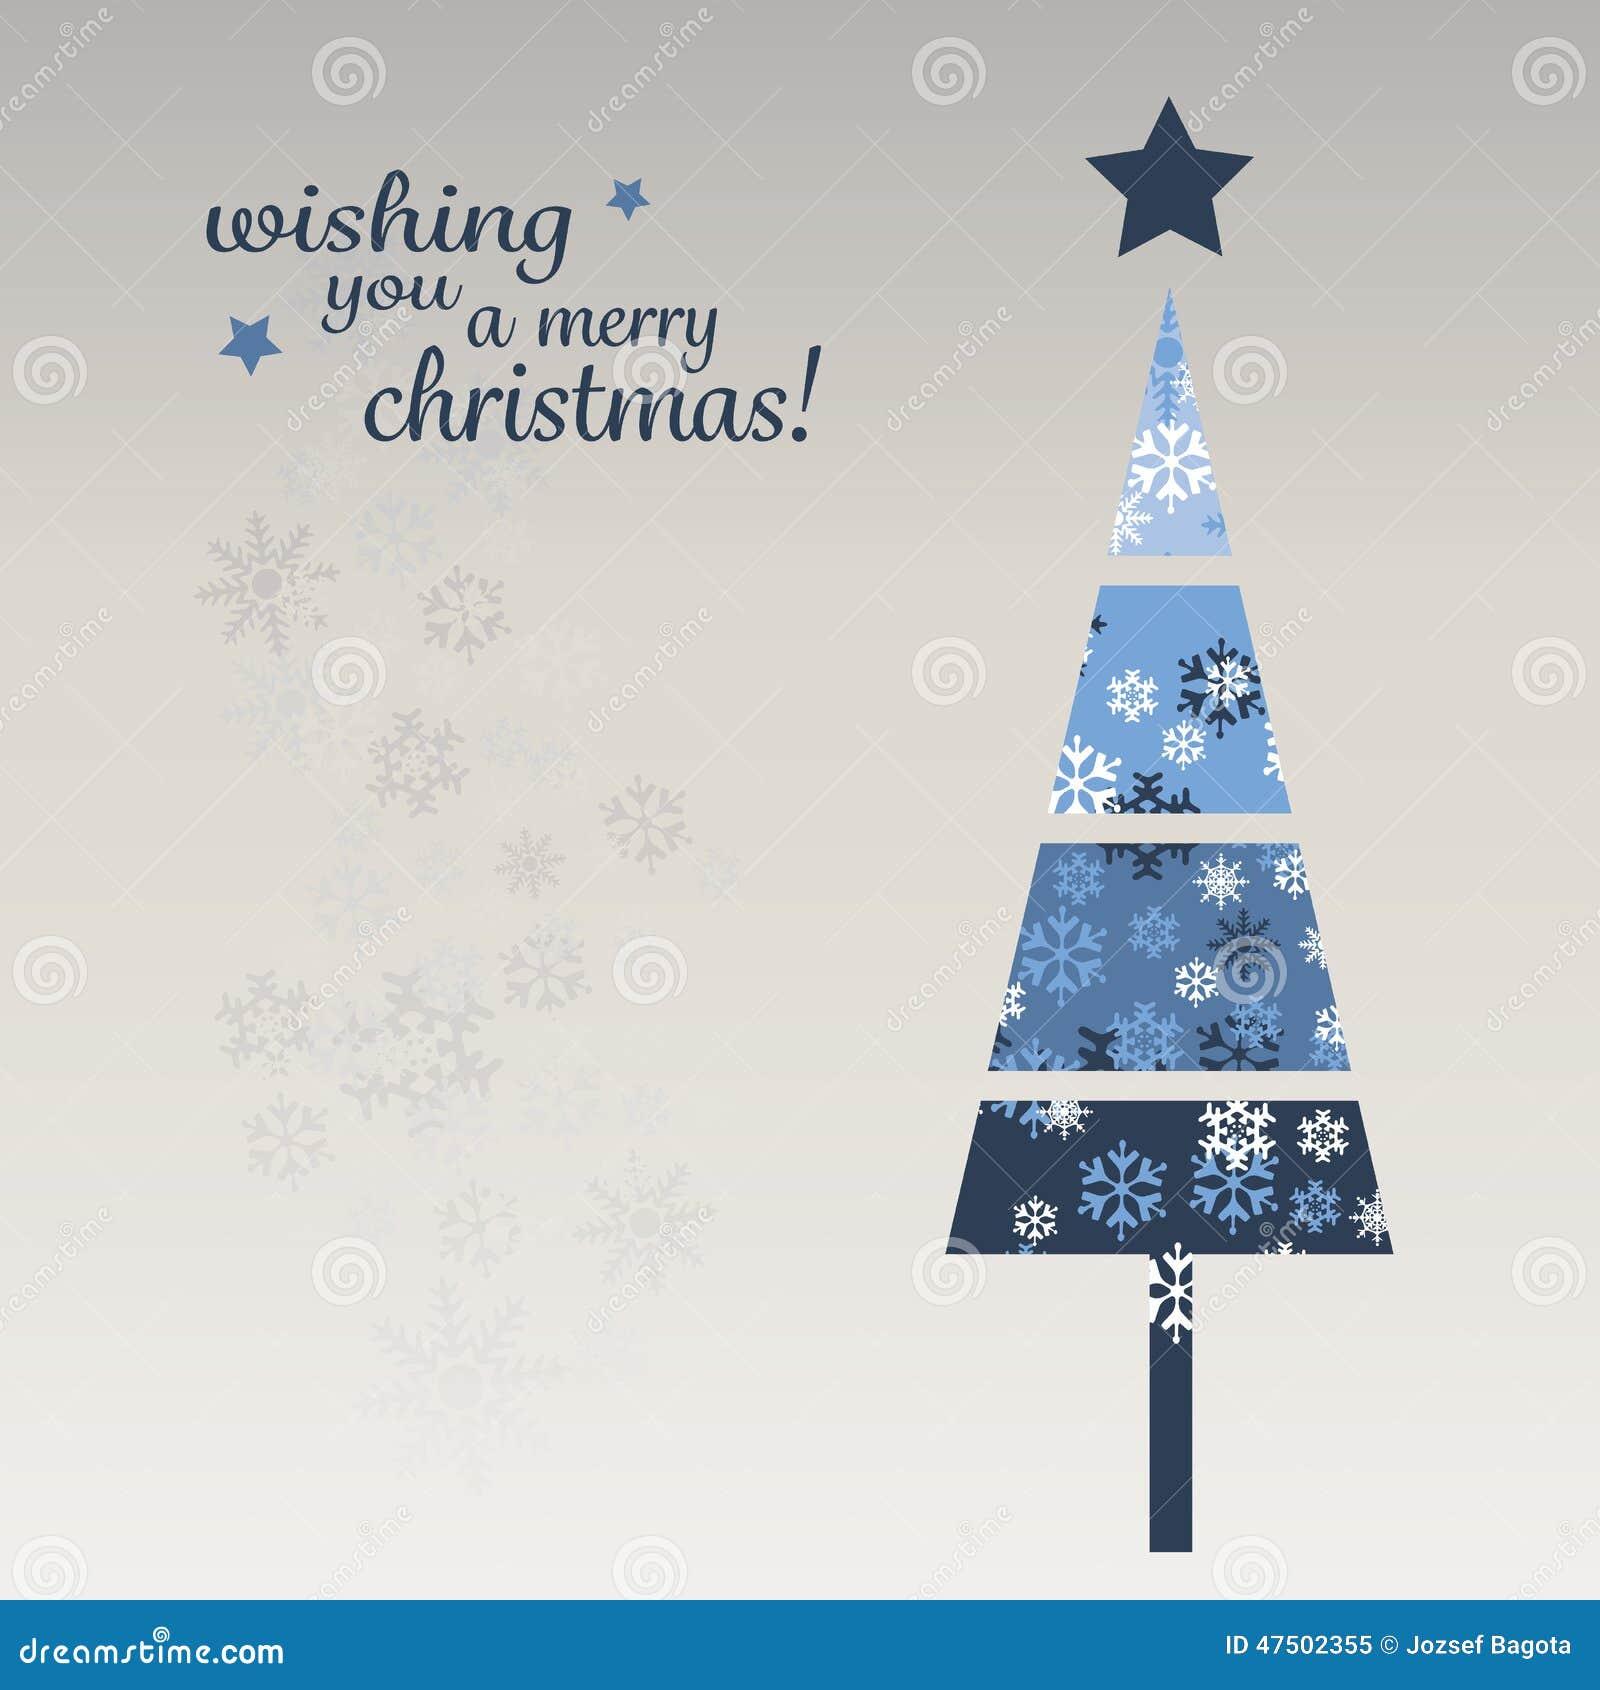 Christmas Greetings Flyer Keninamas